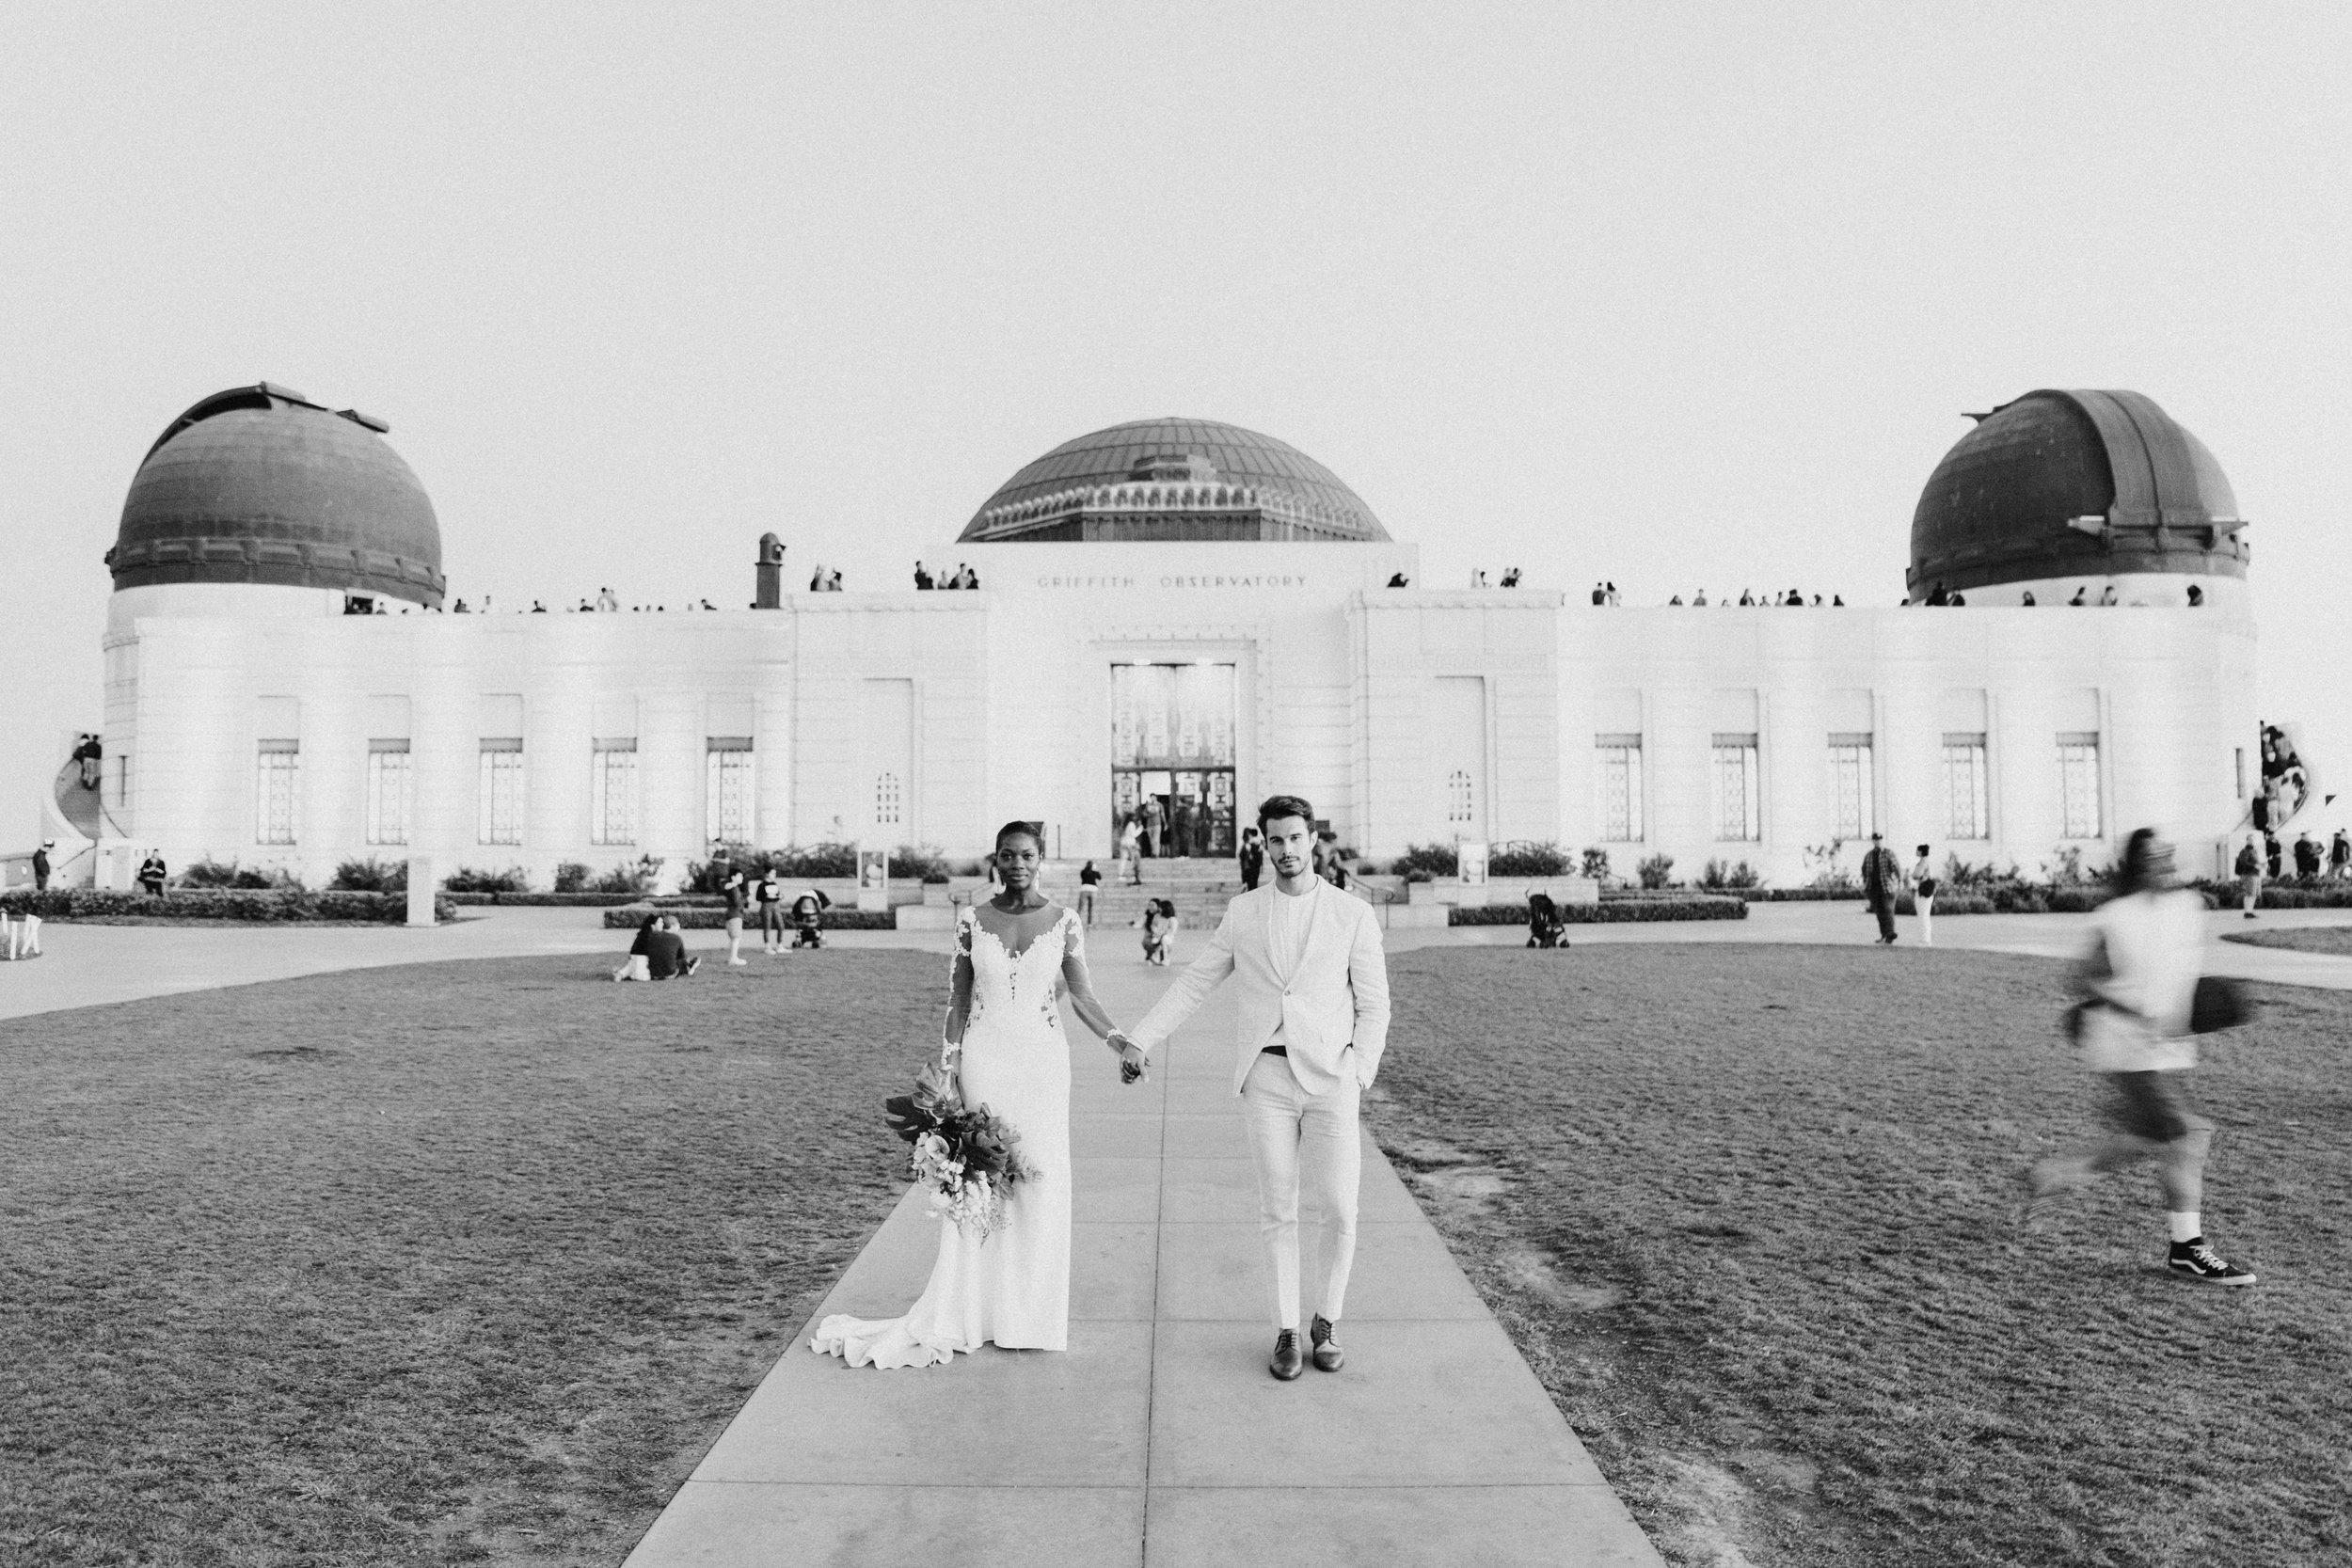 los-angeles-california-griffith-observatory-wedding-bridal-photography-michael-cozzens-84.jpg